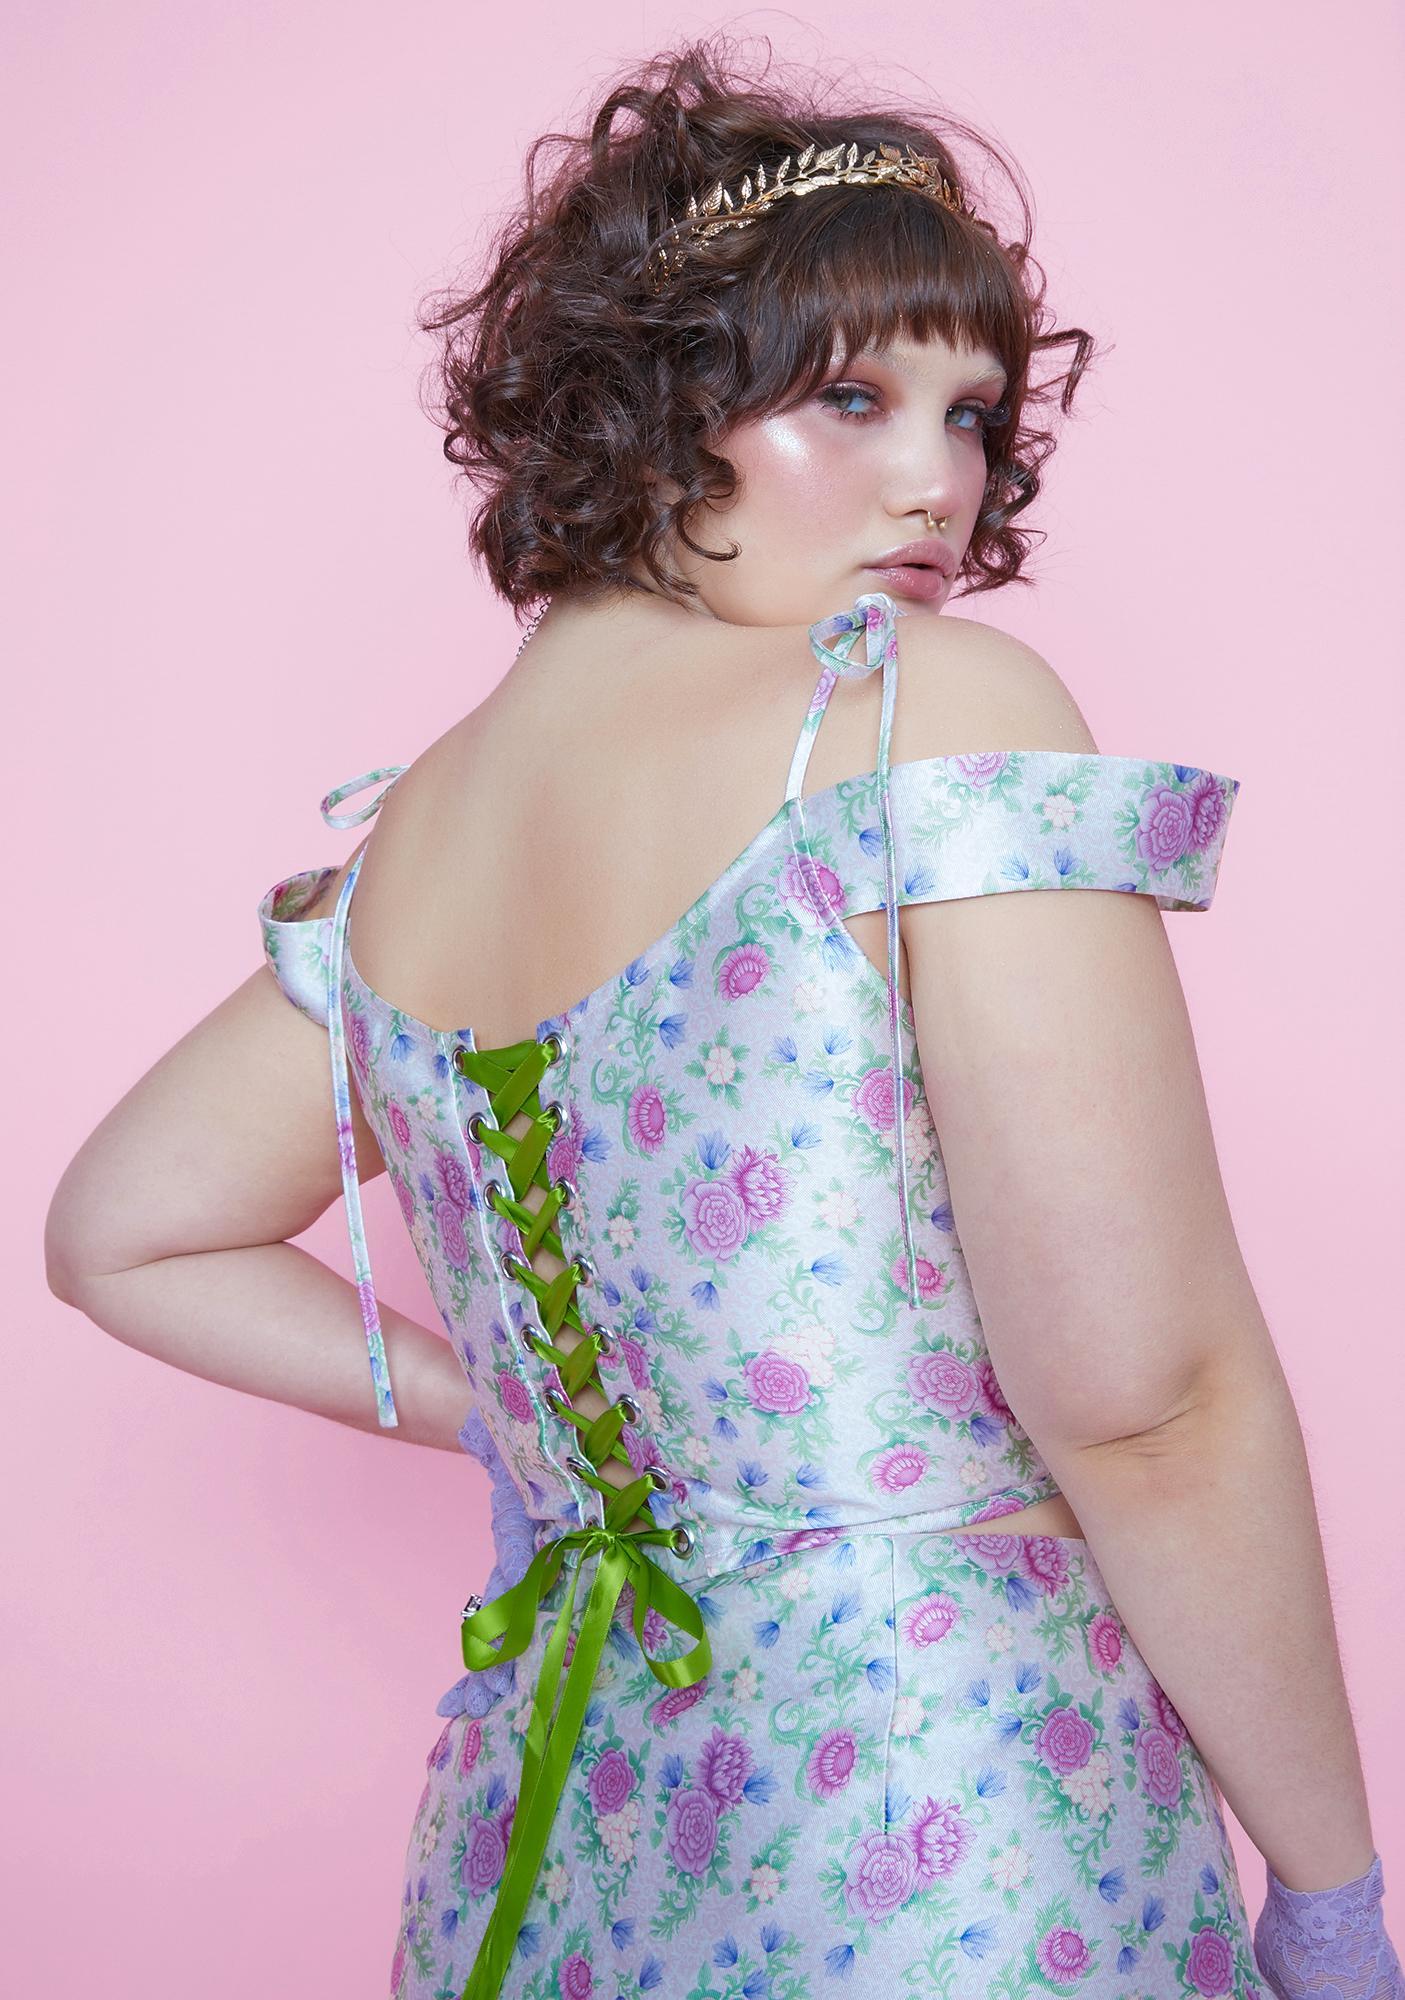 Sugar Thrillz Blooming Pretty Polaroid Fever Mini Skirt